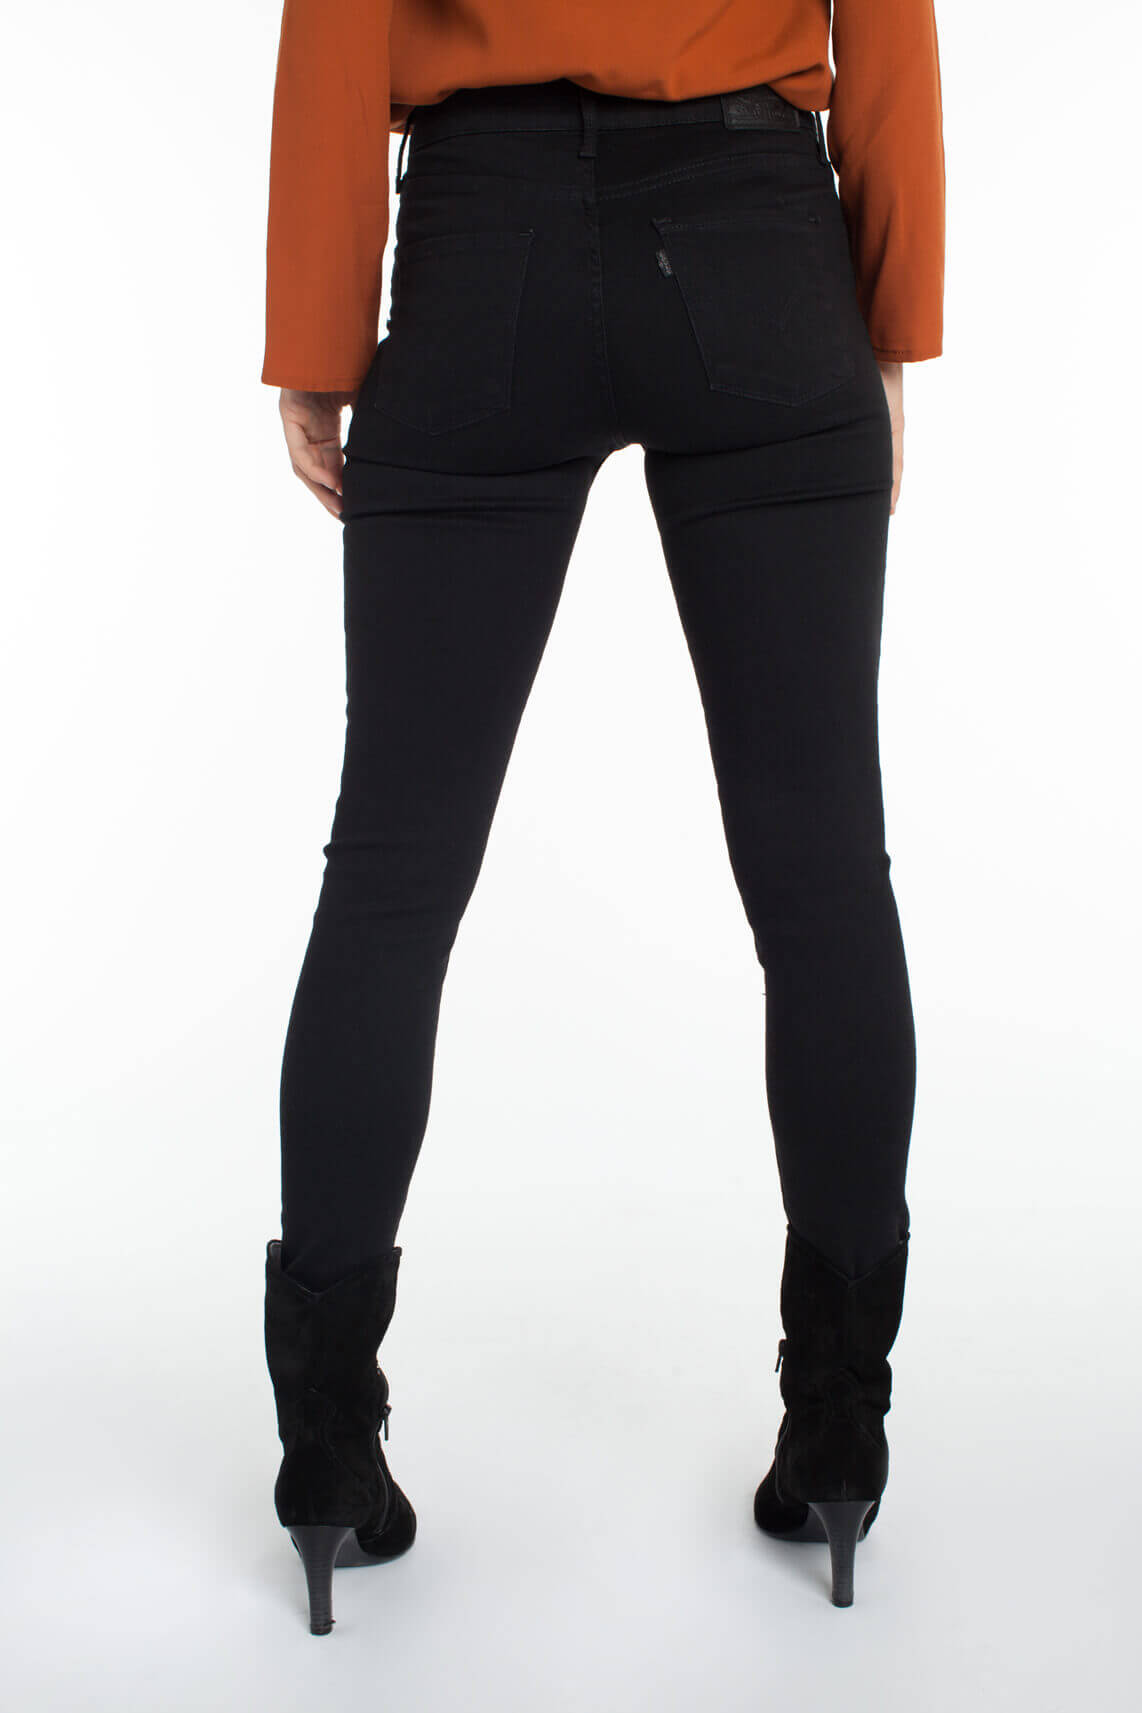 Levi s Dames 310 shaping super skinny jeans zwart